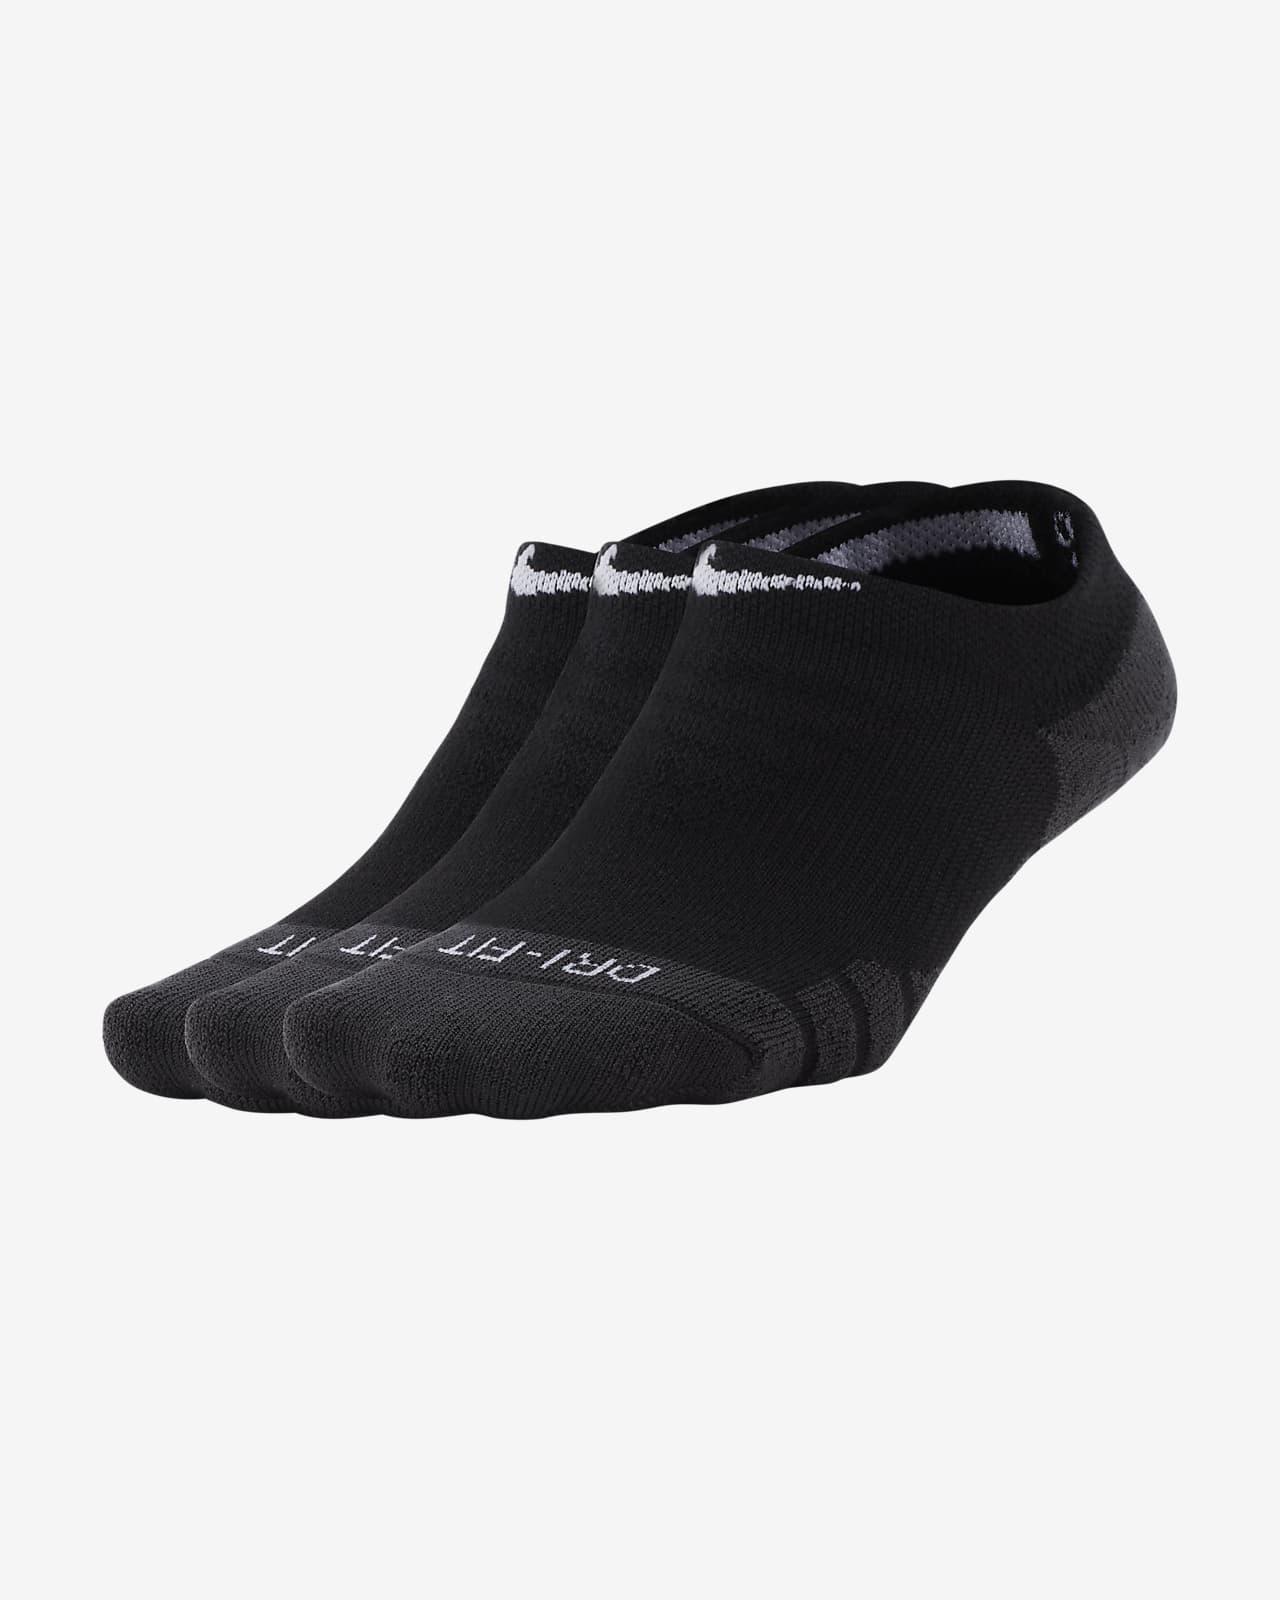 Calcetines de entrenamiento invisibles para mujer Nike Everyday Max Cushioned (3 pares)